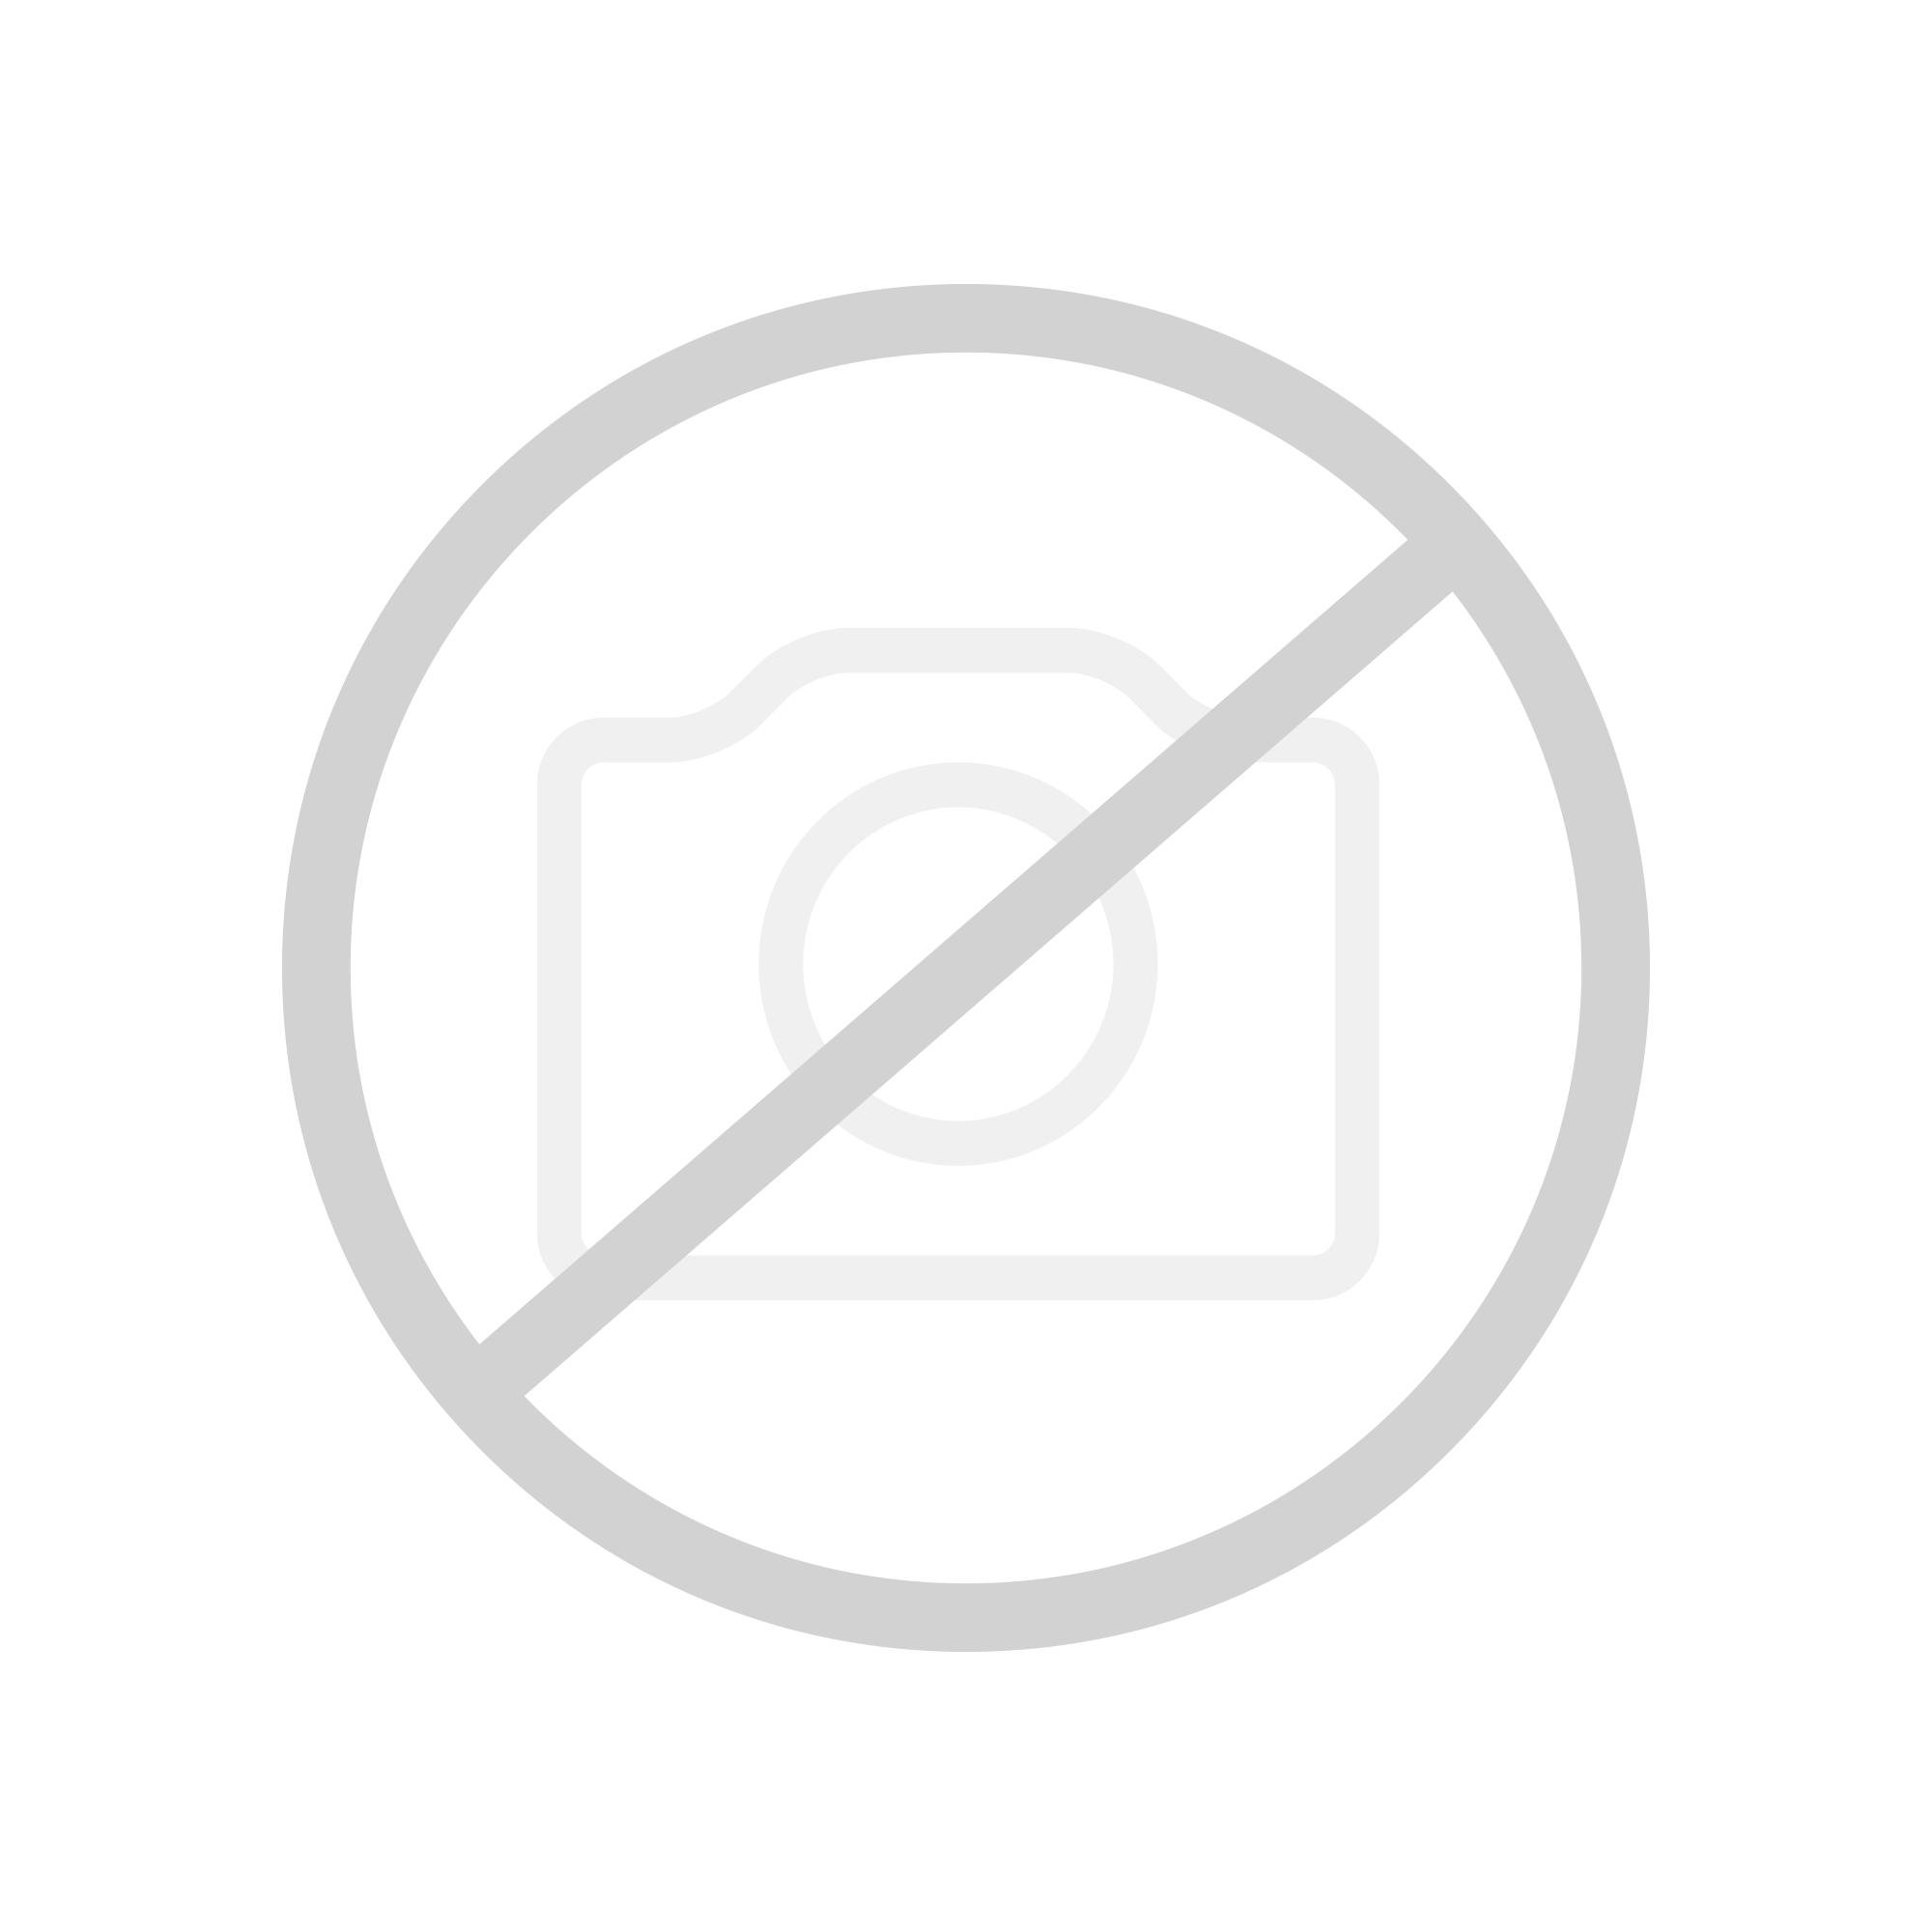 Keramag Renova Nr. 1 Wand-Tiefspül-WC ohne Spülrand L: 54 B: 35,5 cm weiß 203050000